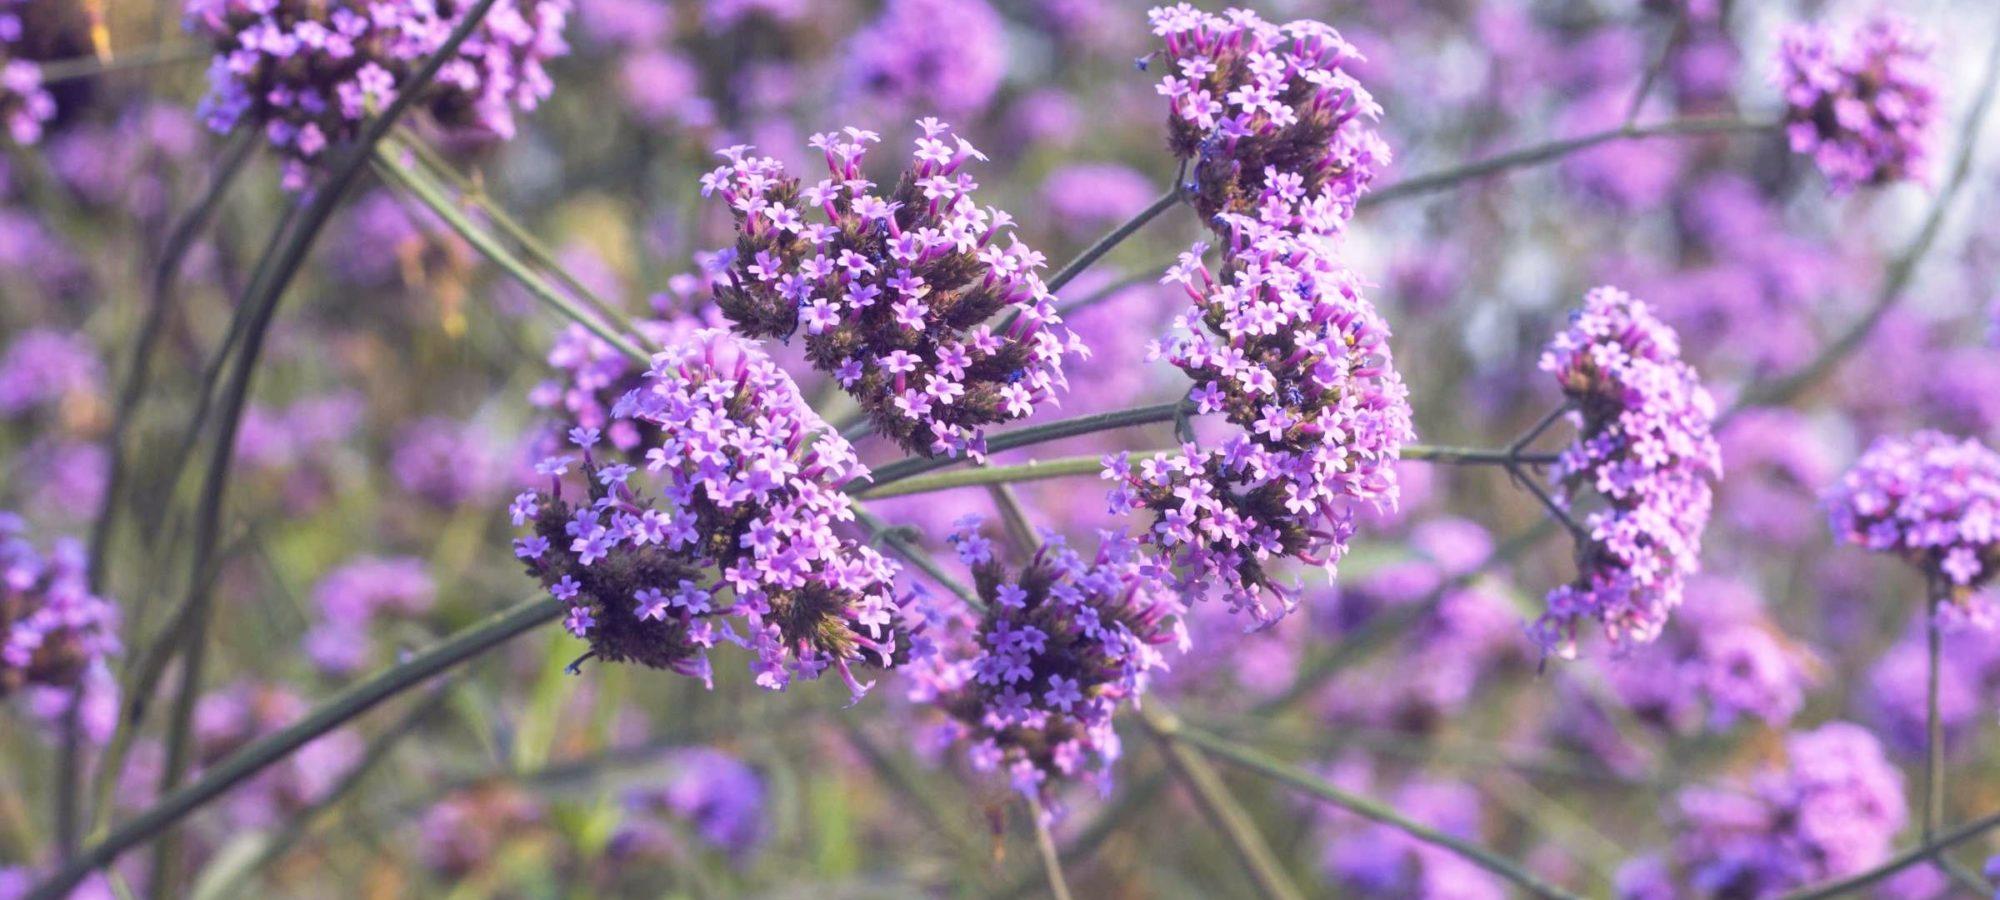 Verbena-bonariensis_De-prachttuinen-freshblue